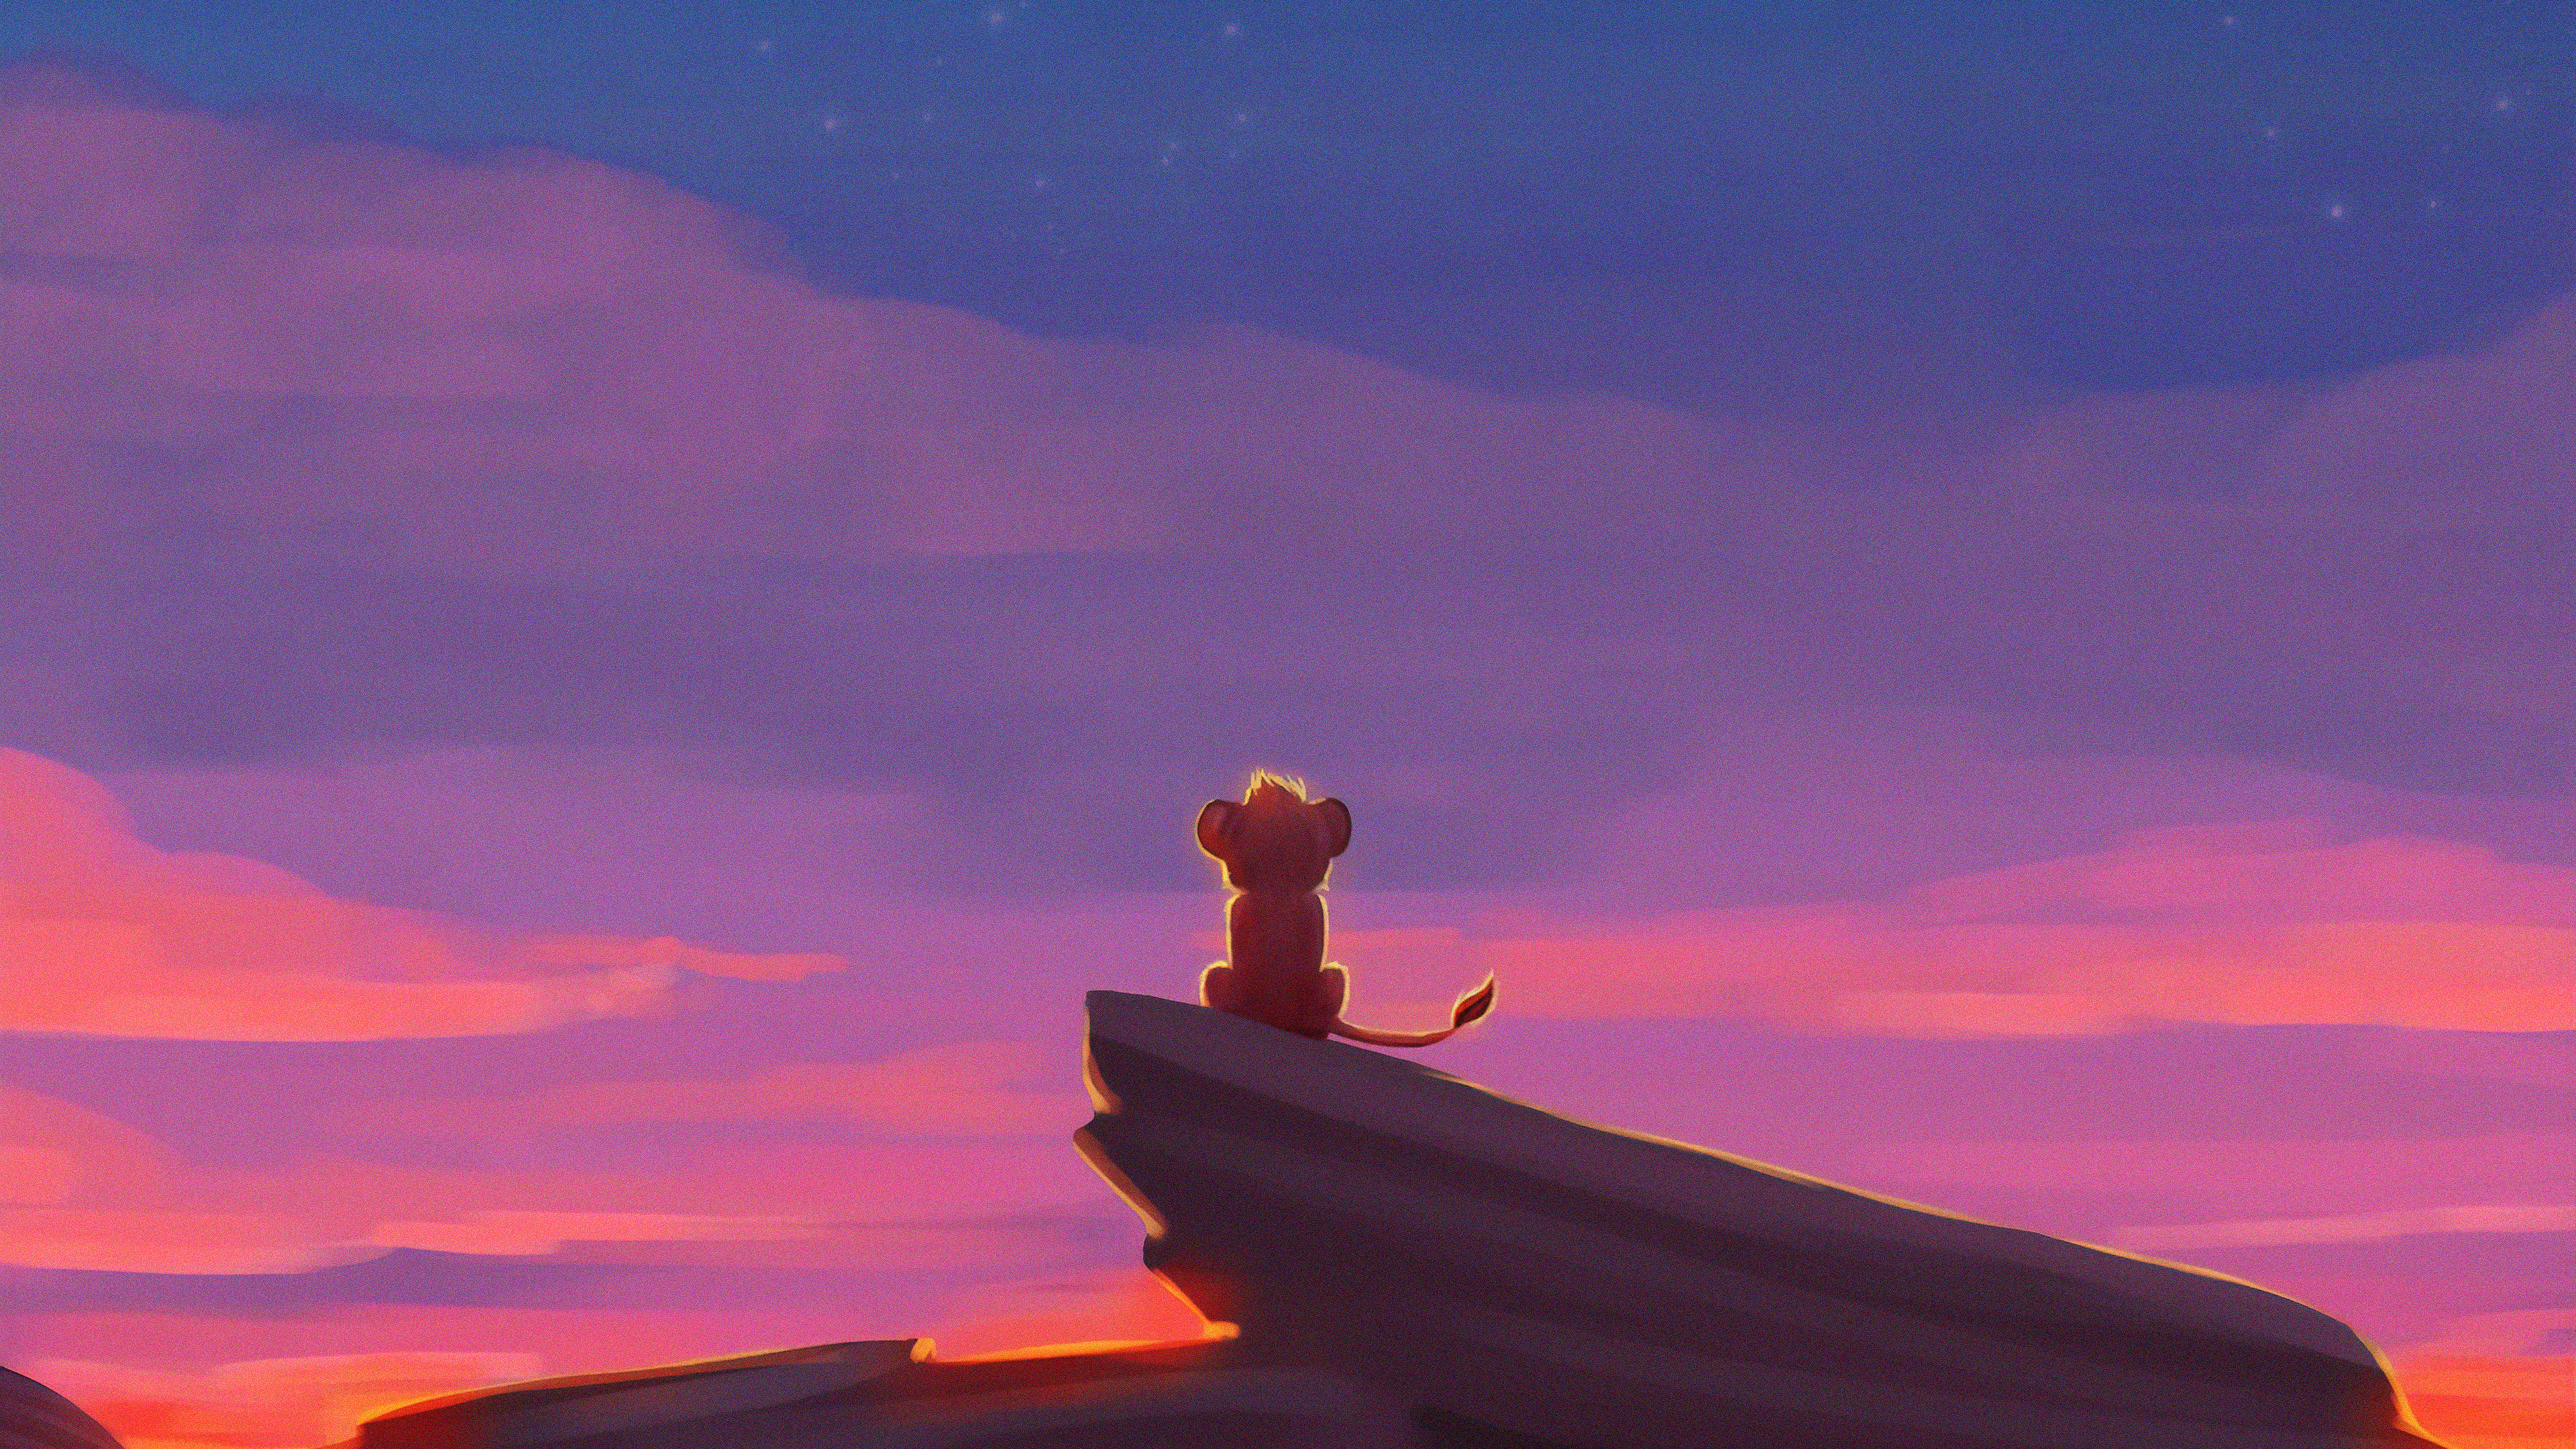 simba the lion king 1565055731 - Simba The Lion King - the lion king wallpapers, simba wallpapers, movies wallpapers, lion wallpapers, hd-wallpapers, disney wallpapers, artstation wallpapers, 4k-wallpapers, 2019 movies wallpapers